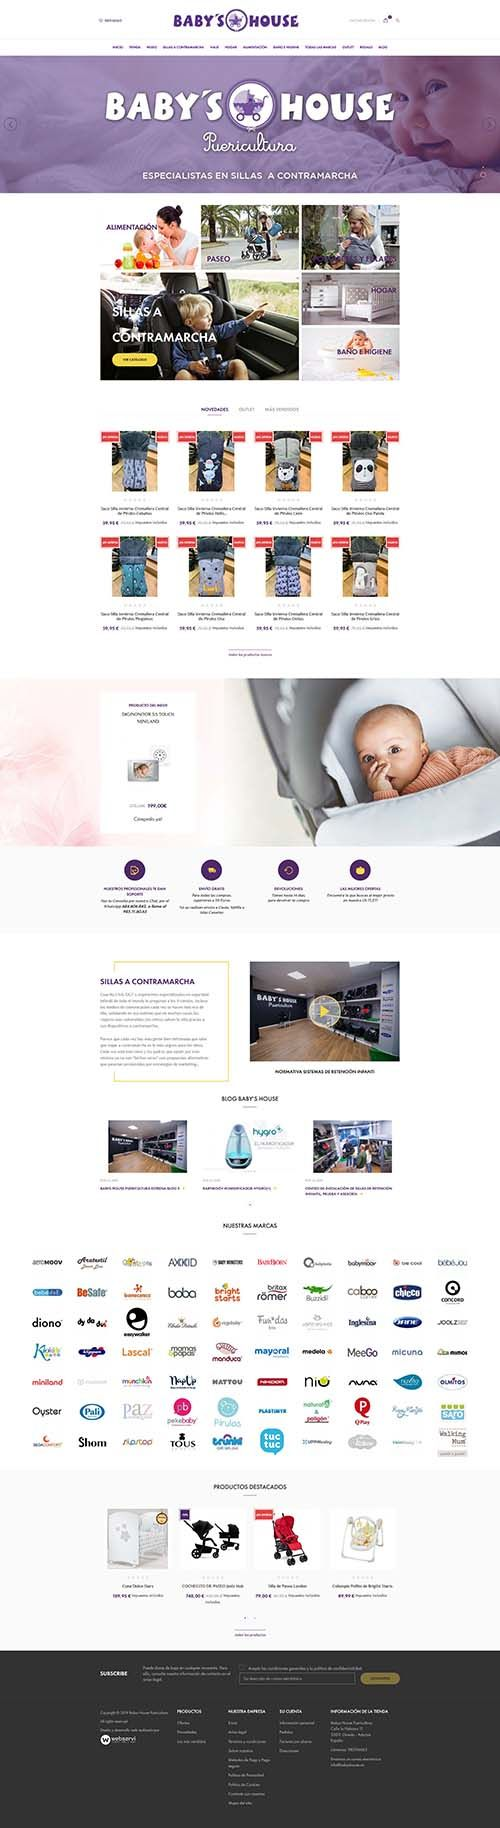 Front Diseño tienda online babys house>